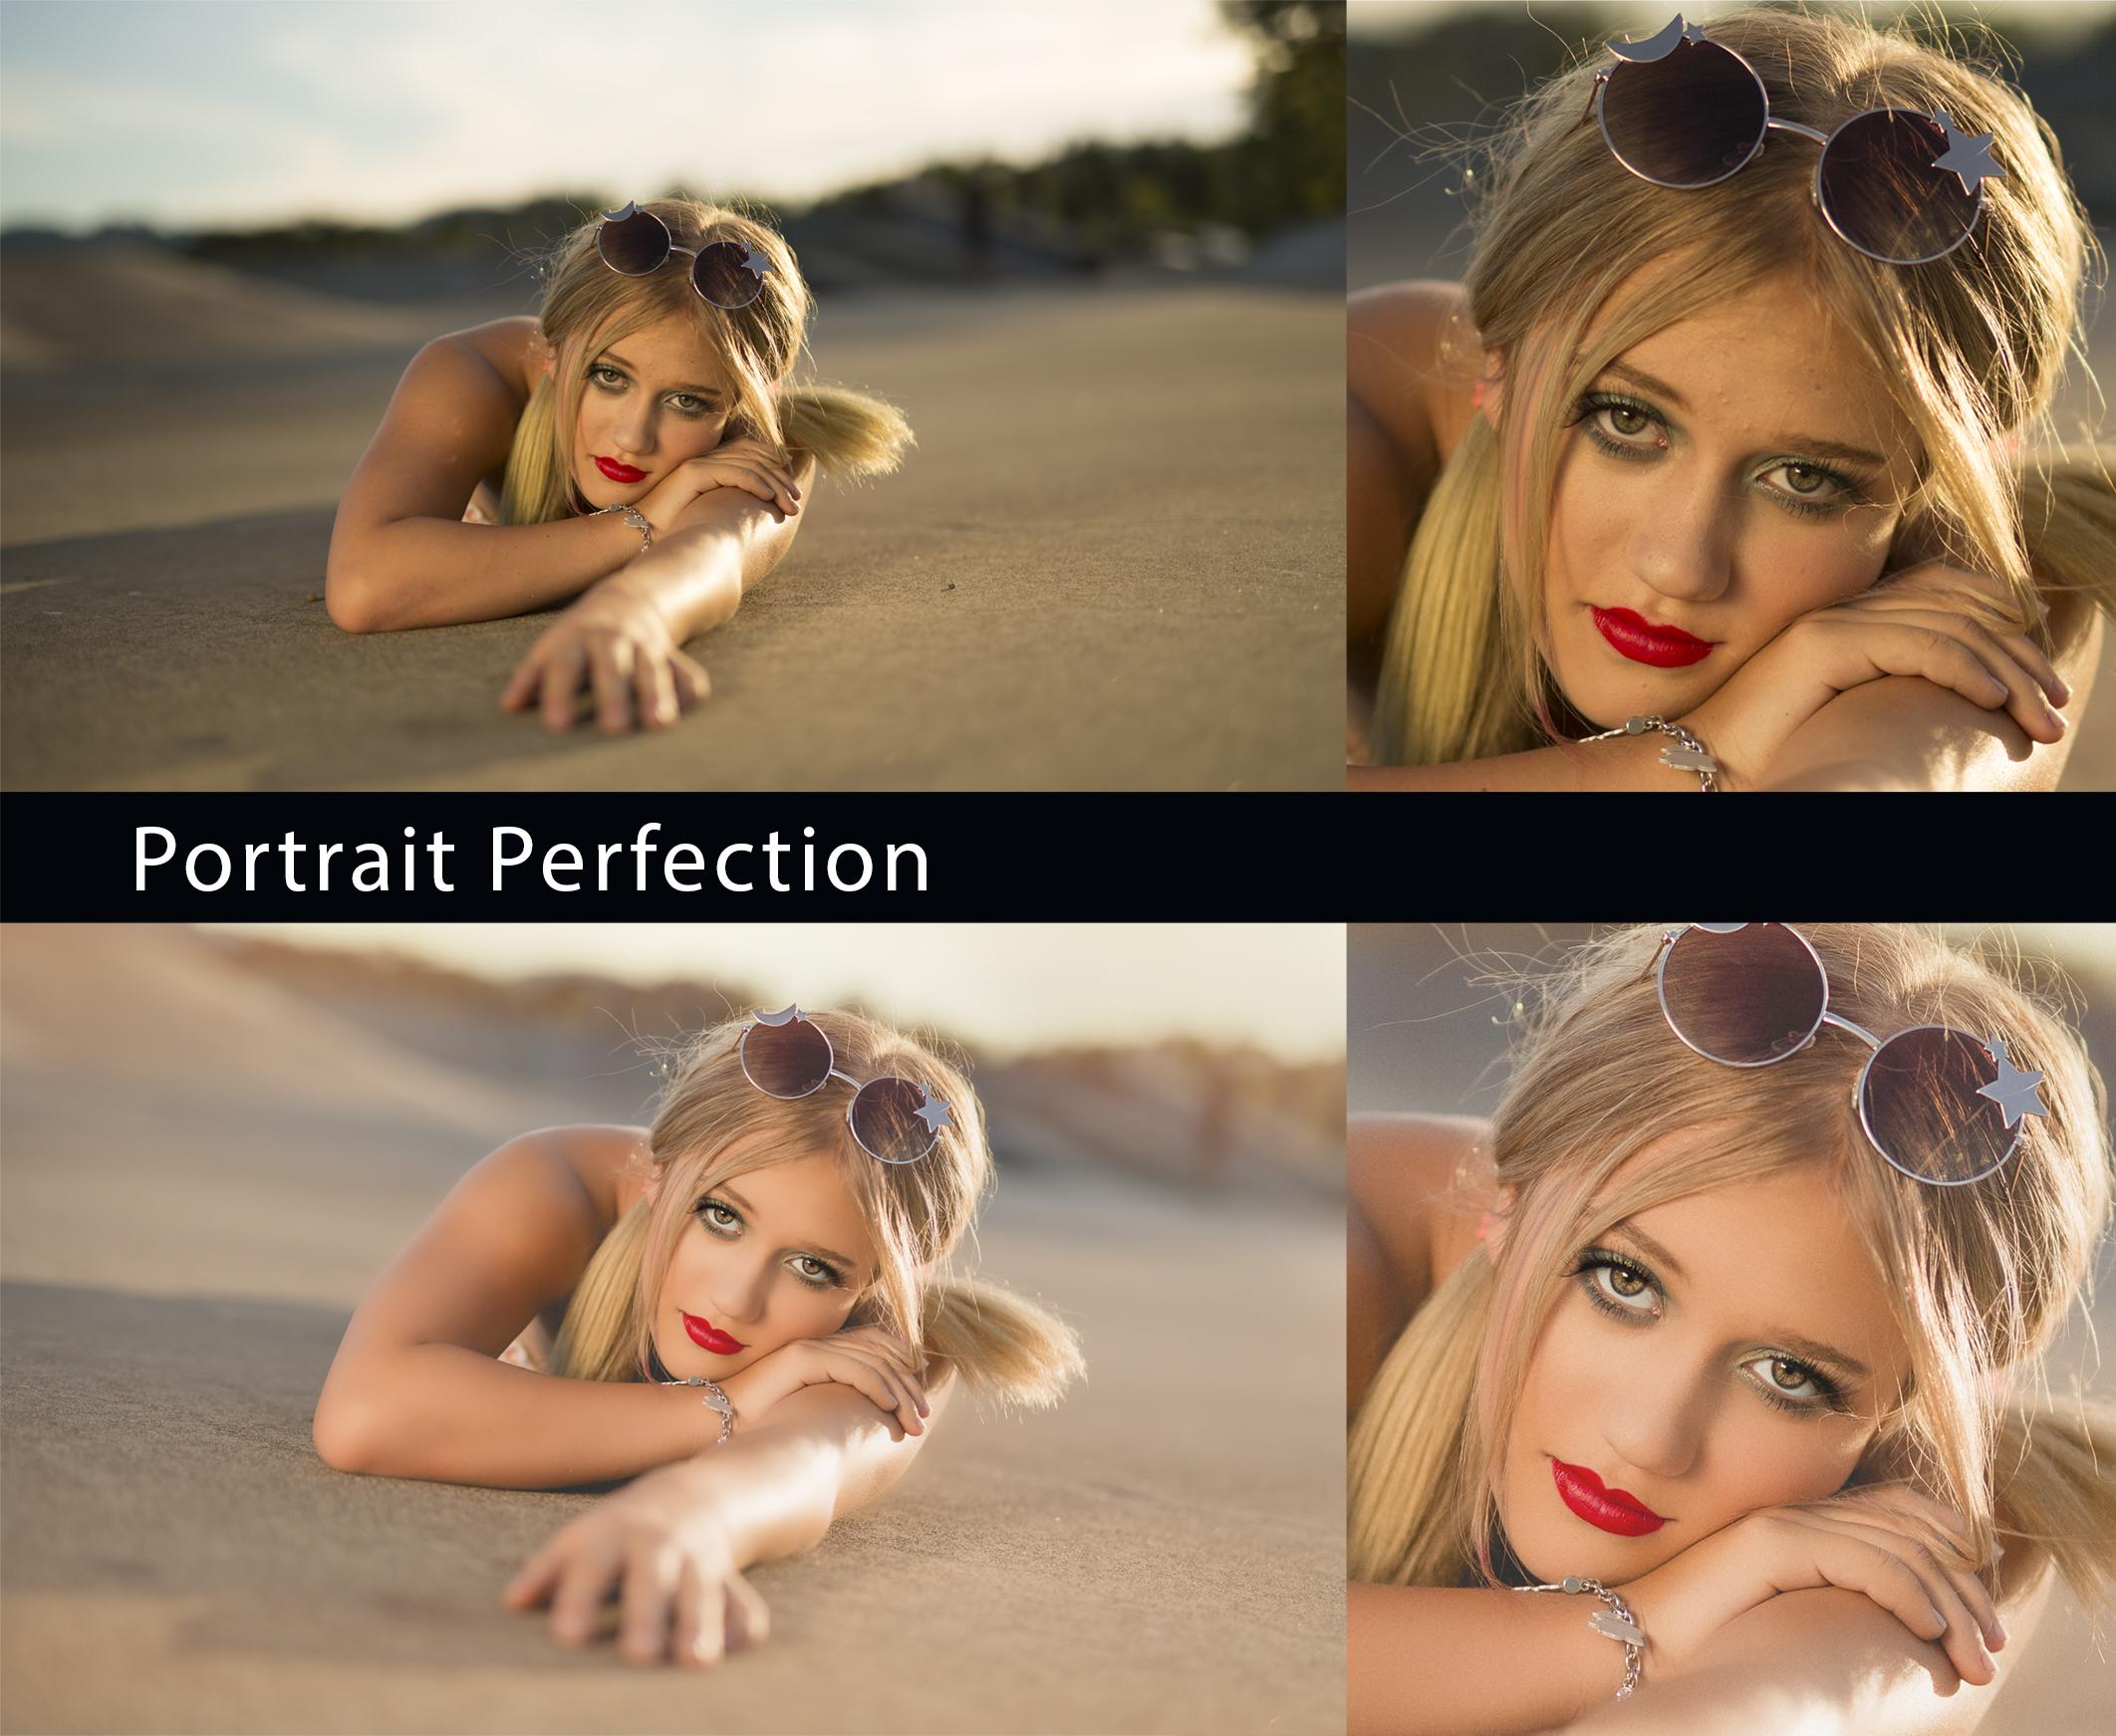 Portraitprefection.jpg